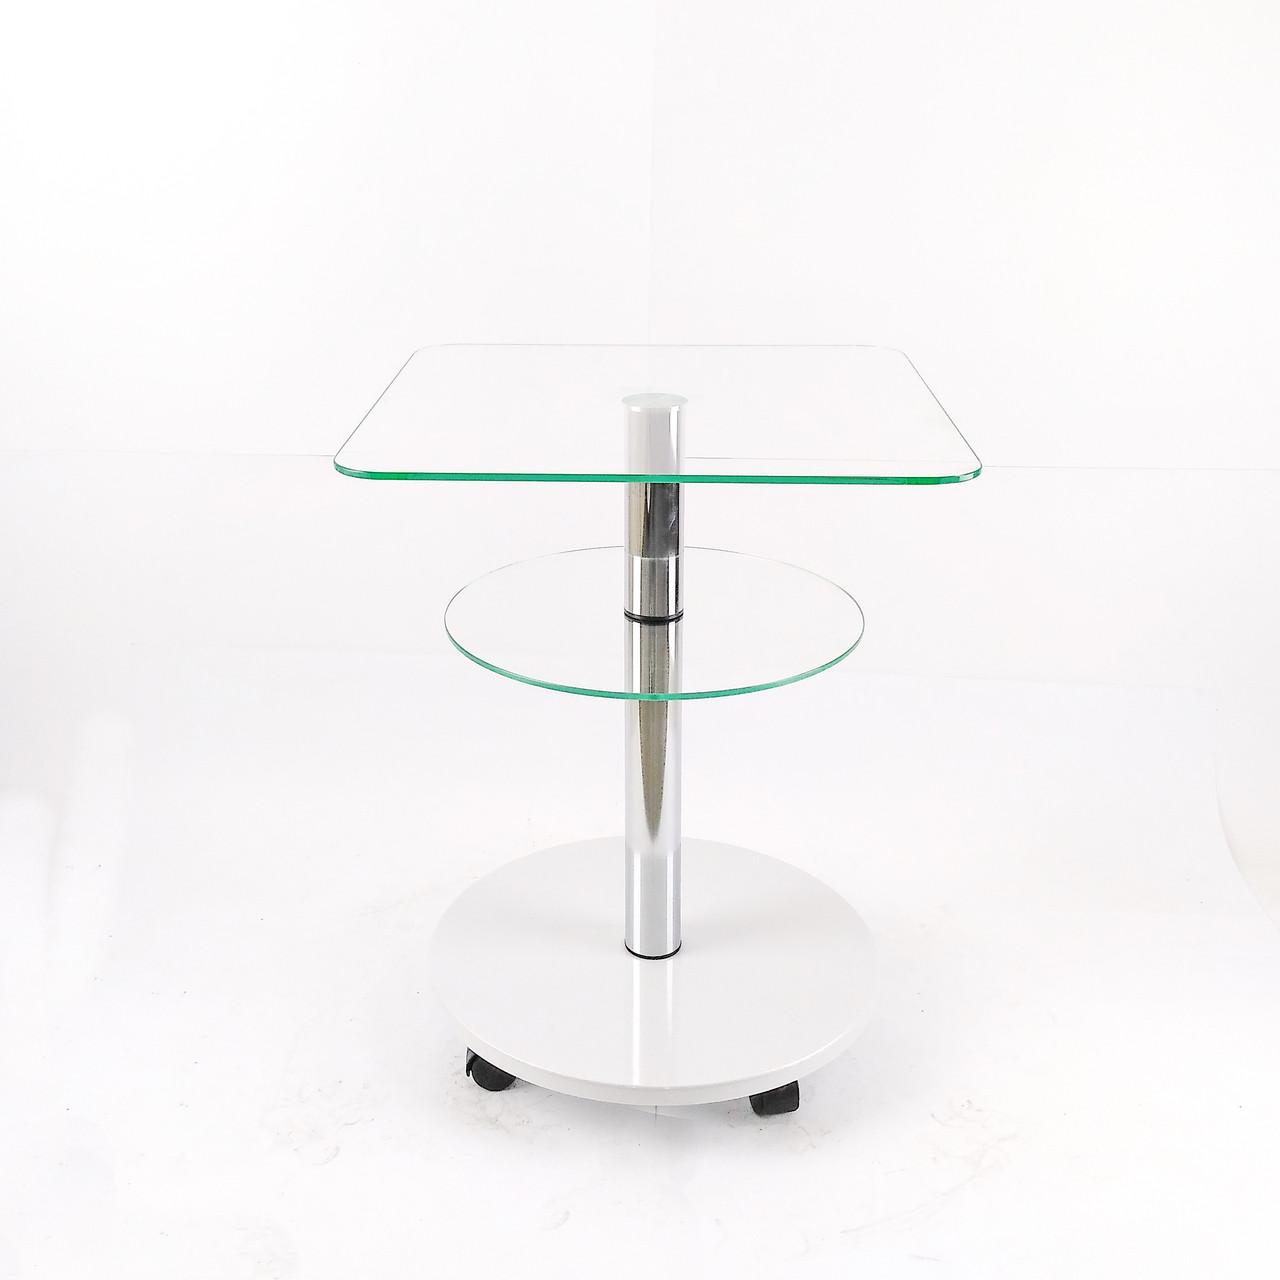 Стеклянный кофейный стол квадратный Commus Bravo Light400 Kv6 clear-white-chr50